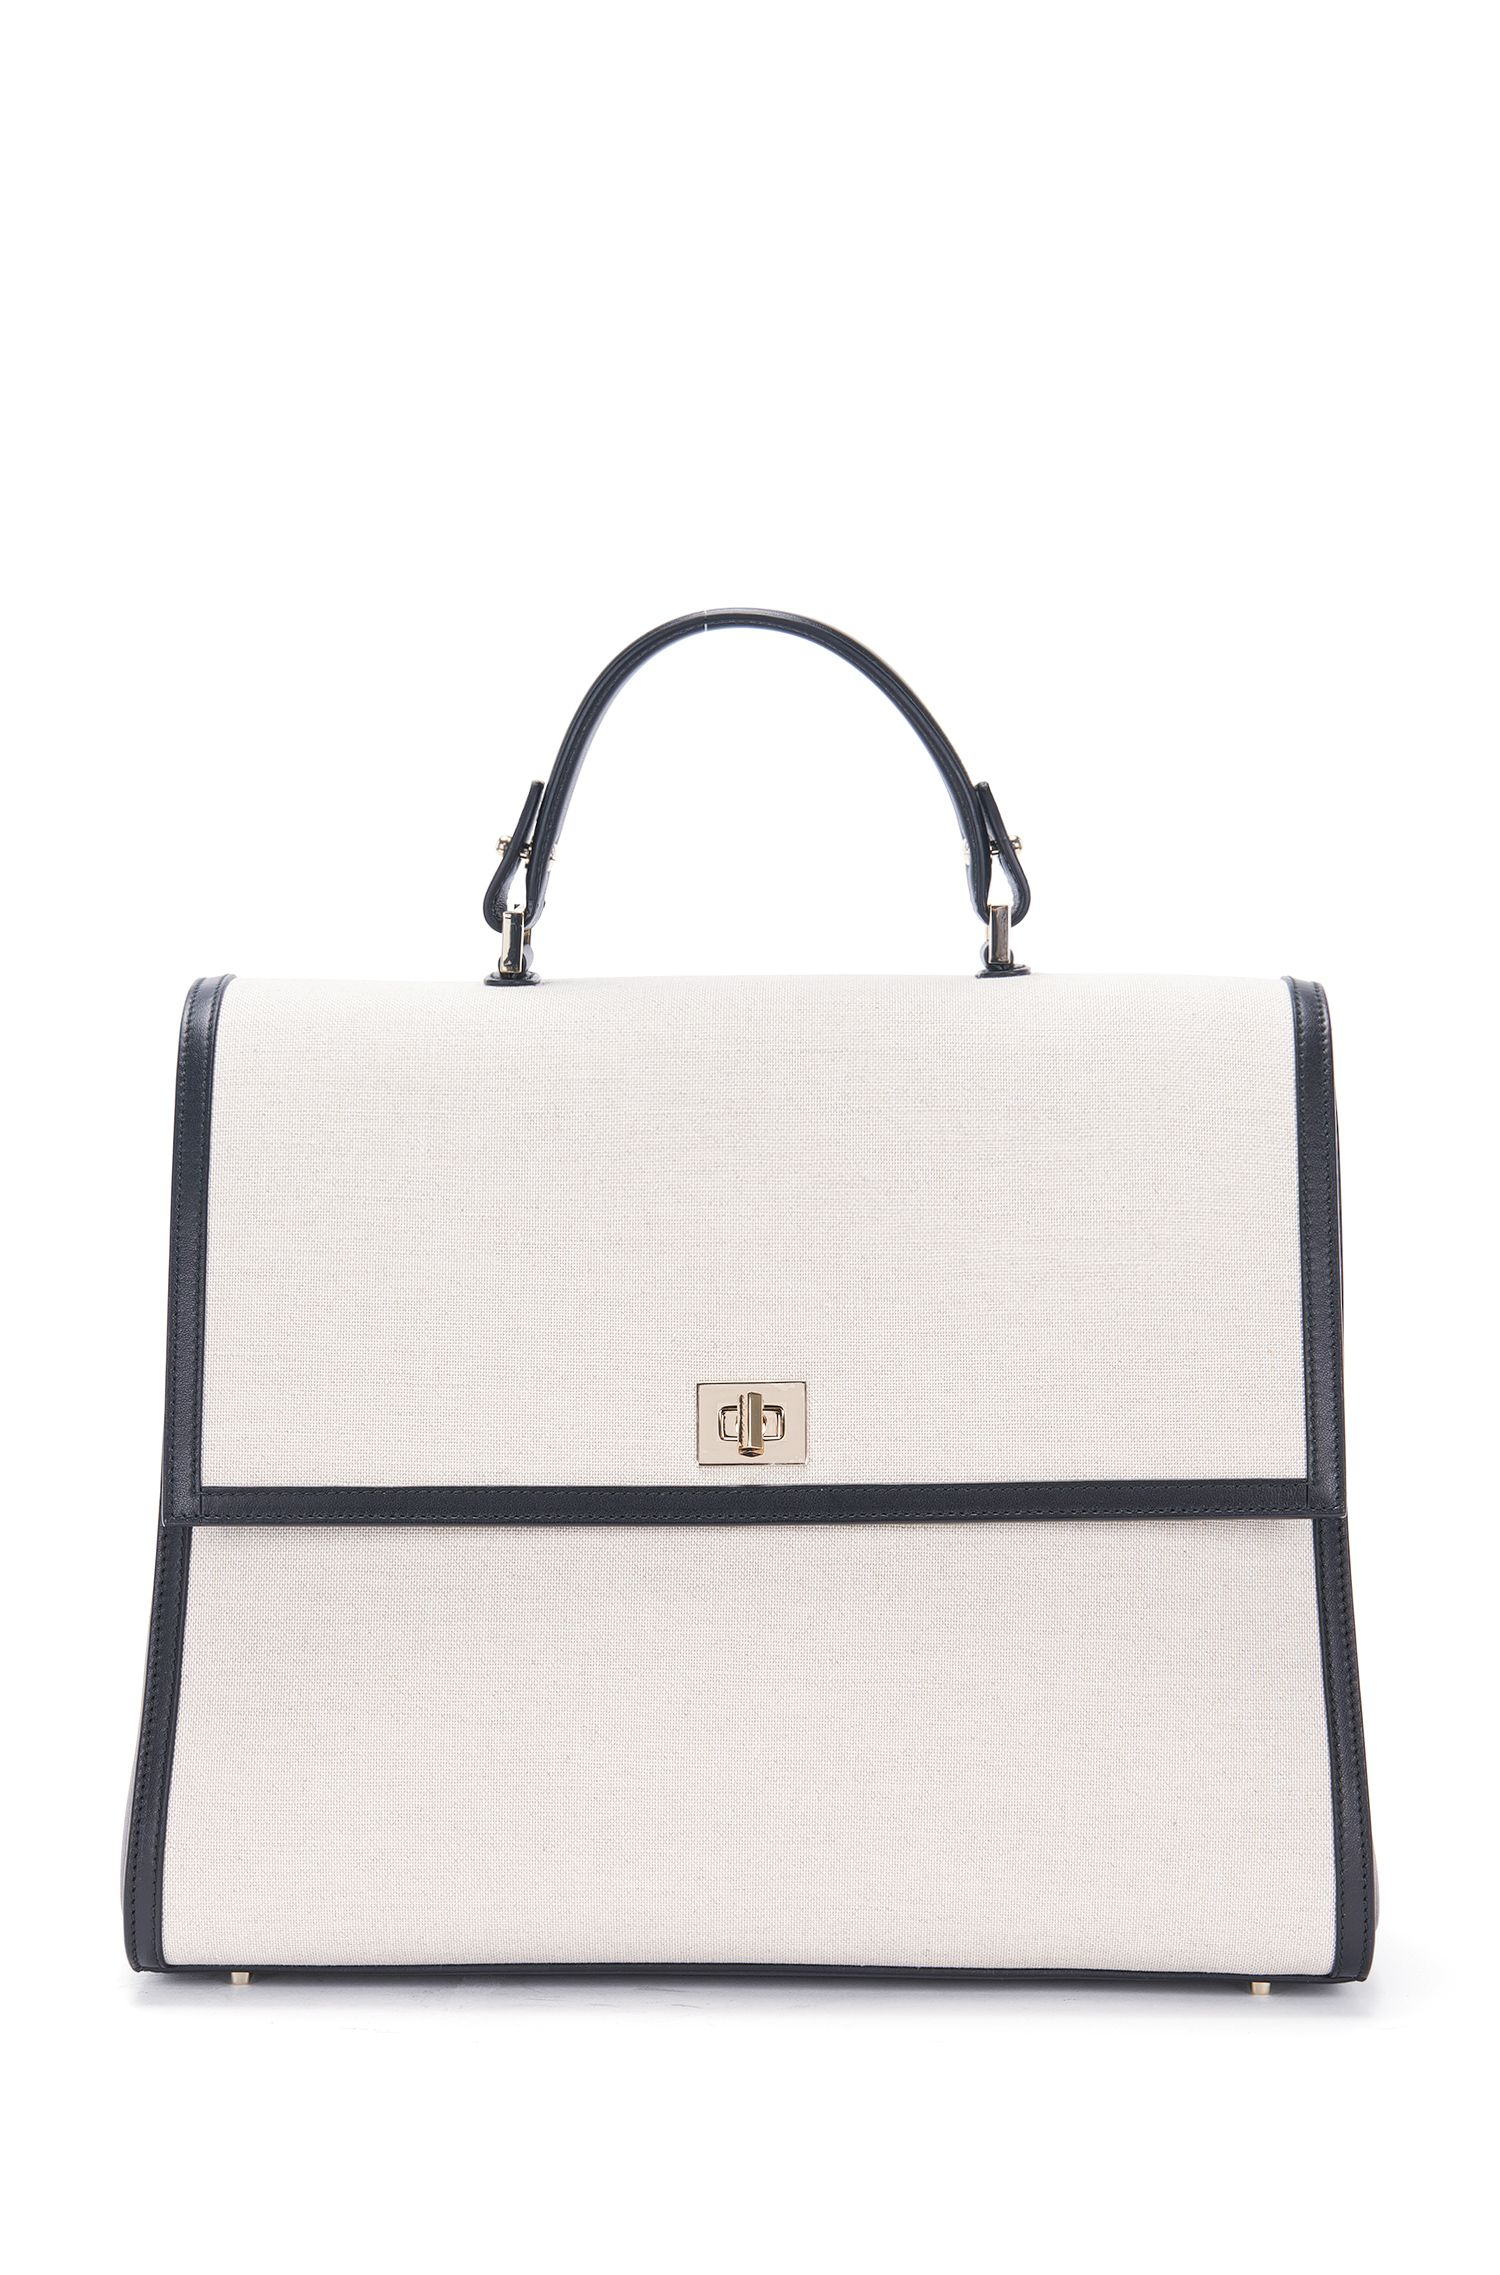 Leather-Trimmed Cotton-Linen Handbag   BOSS Bespoke TH M SC